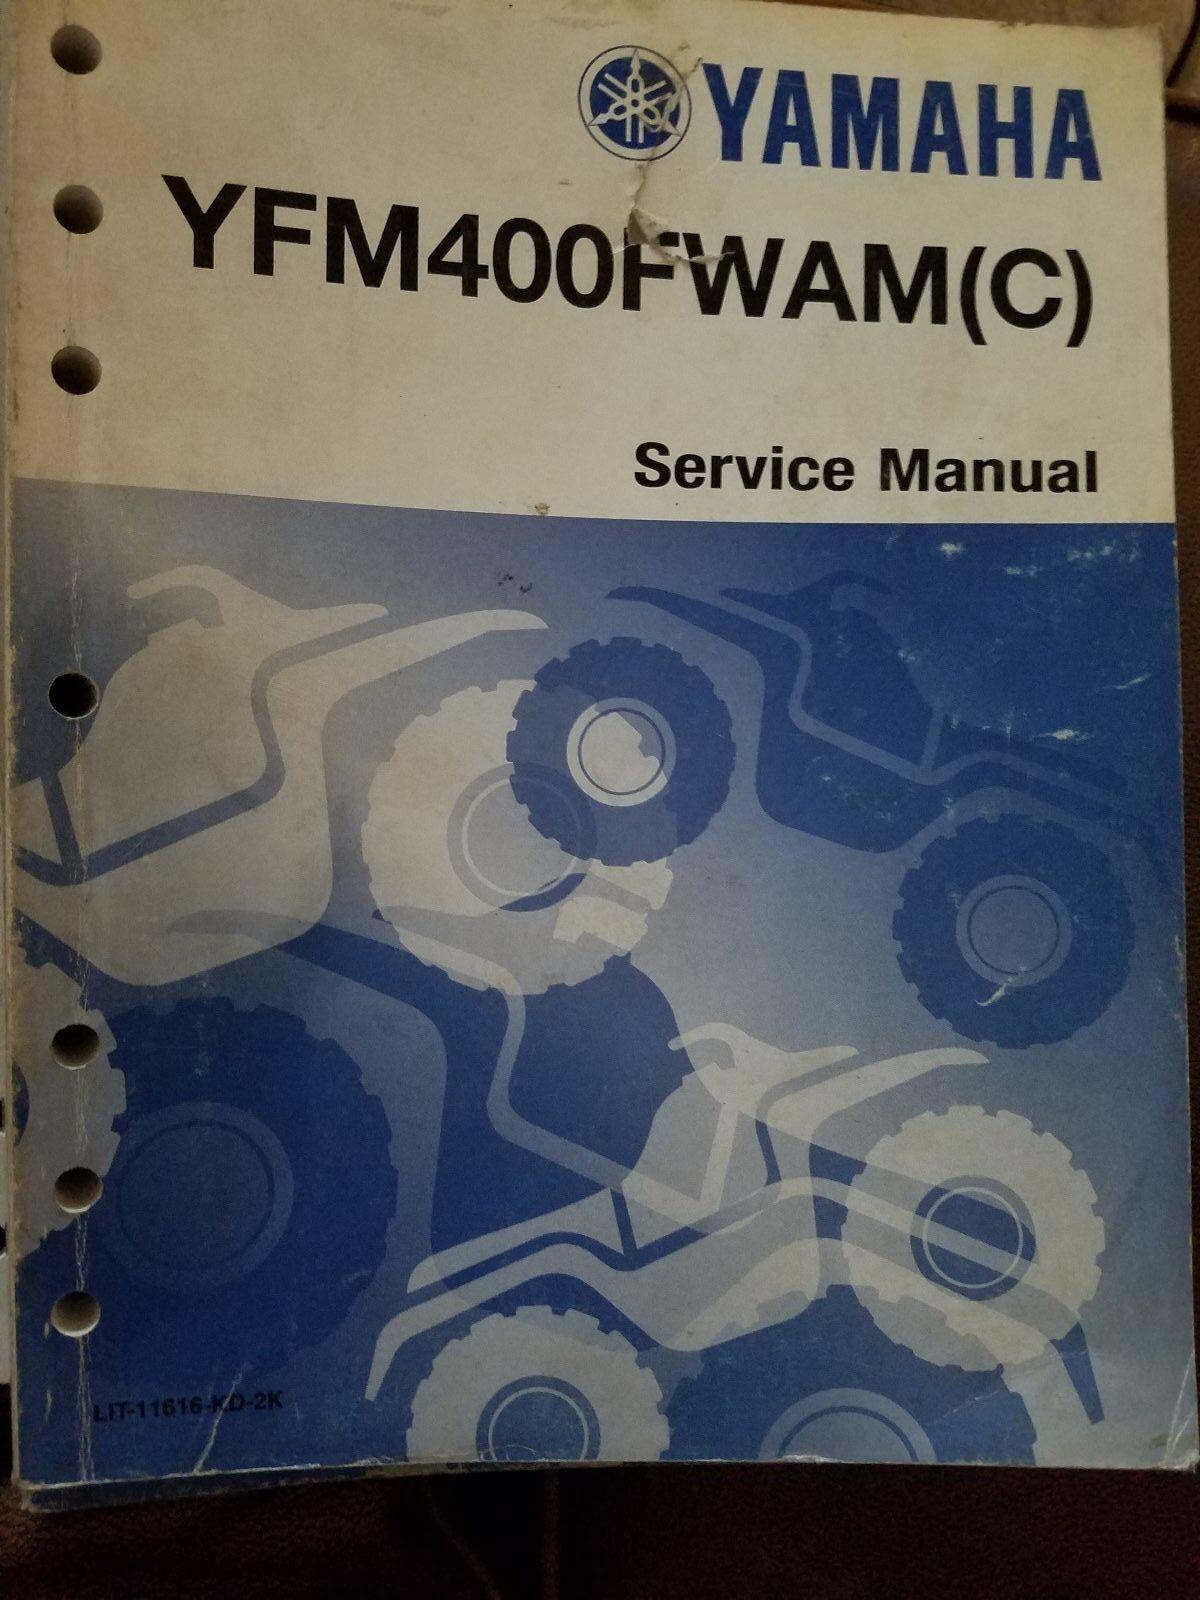 Used Yamaha Service Manual YFM400FWAM(C) LIT-11616-KD-2K